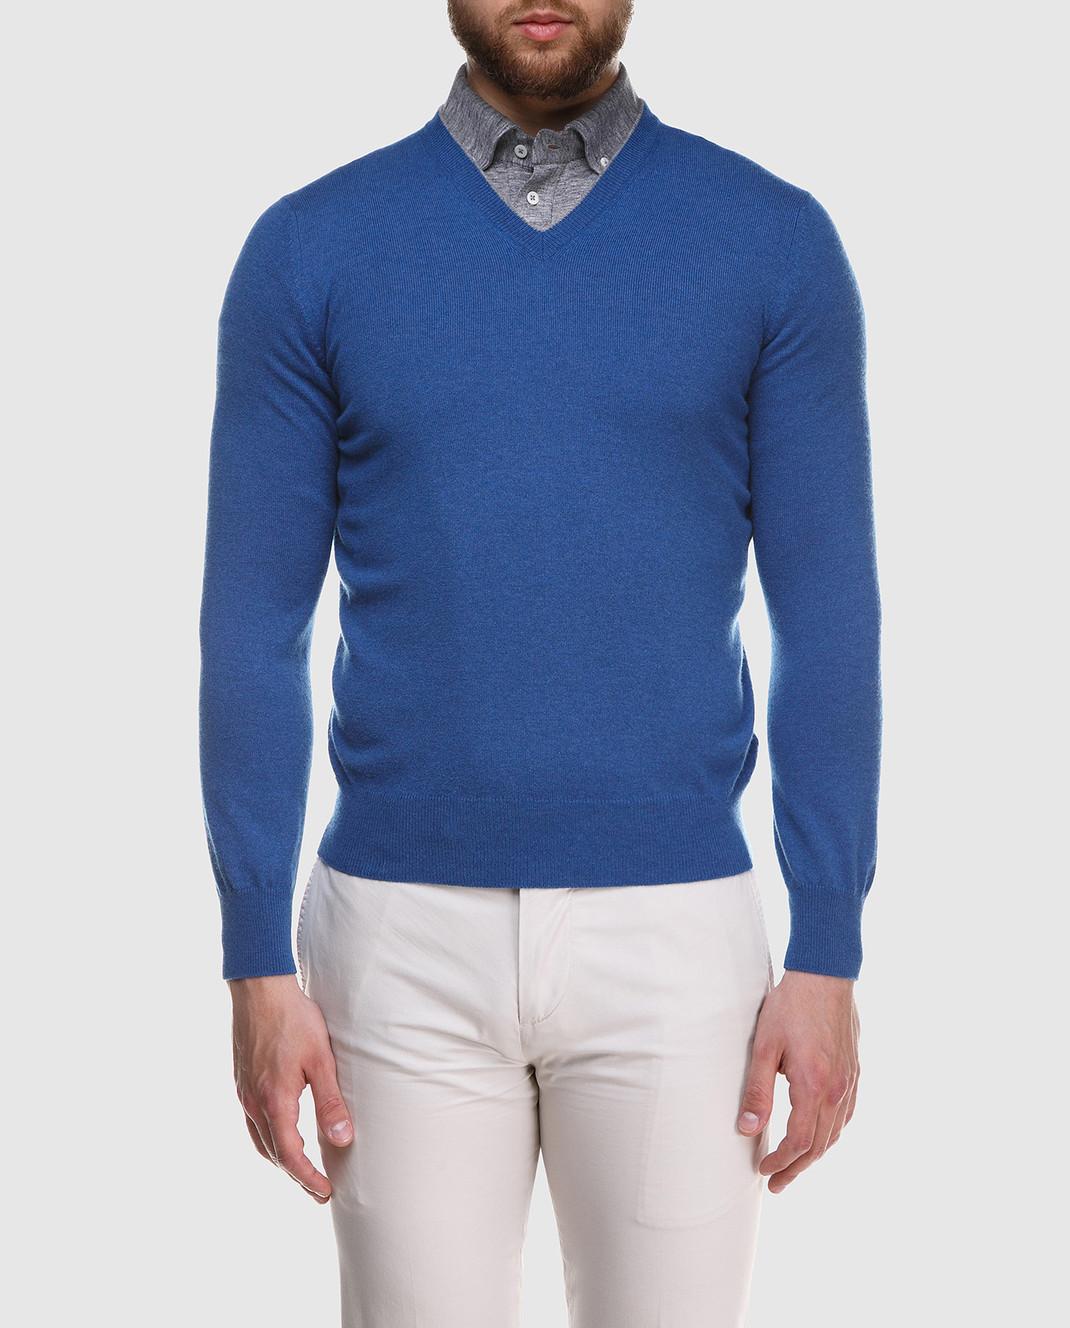 Brunello Cucinelli Синий пуловер M2200162 изображение 3